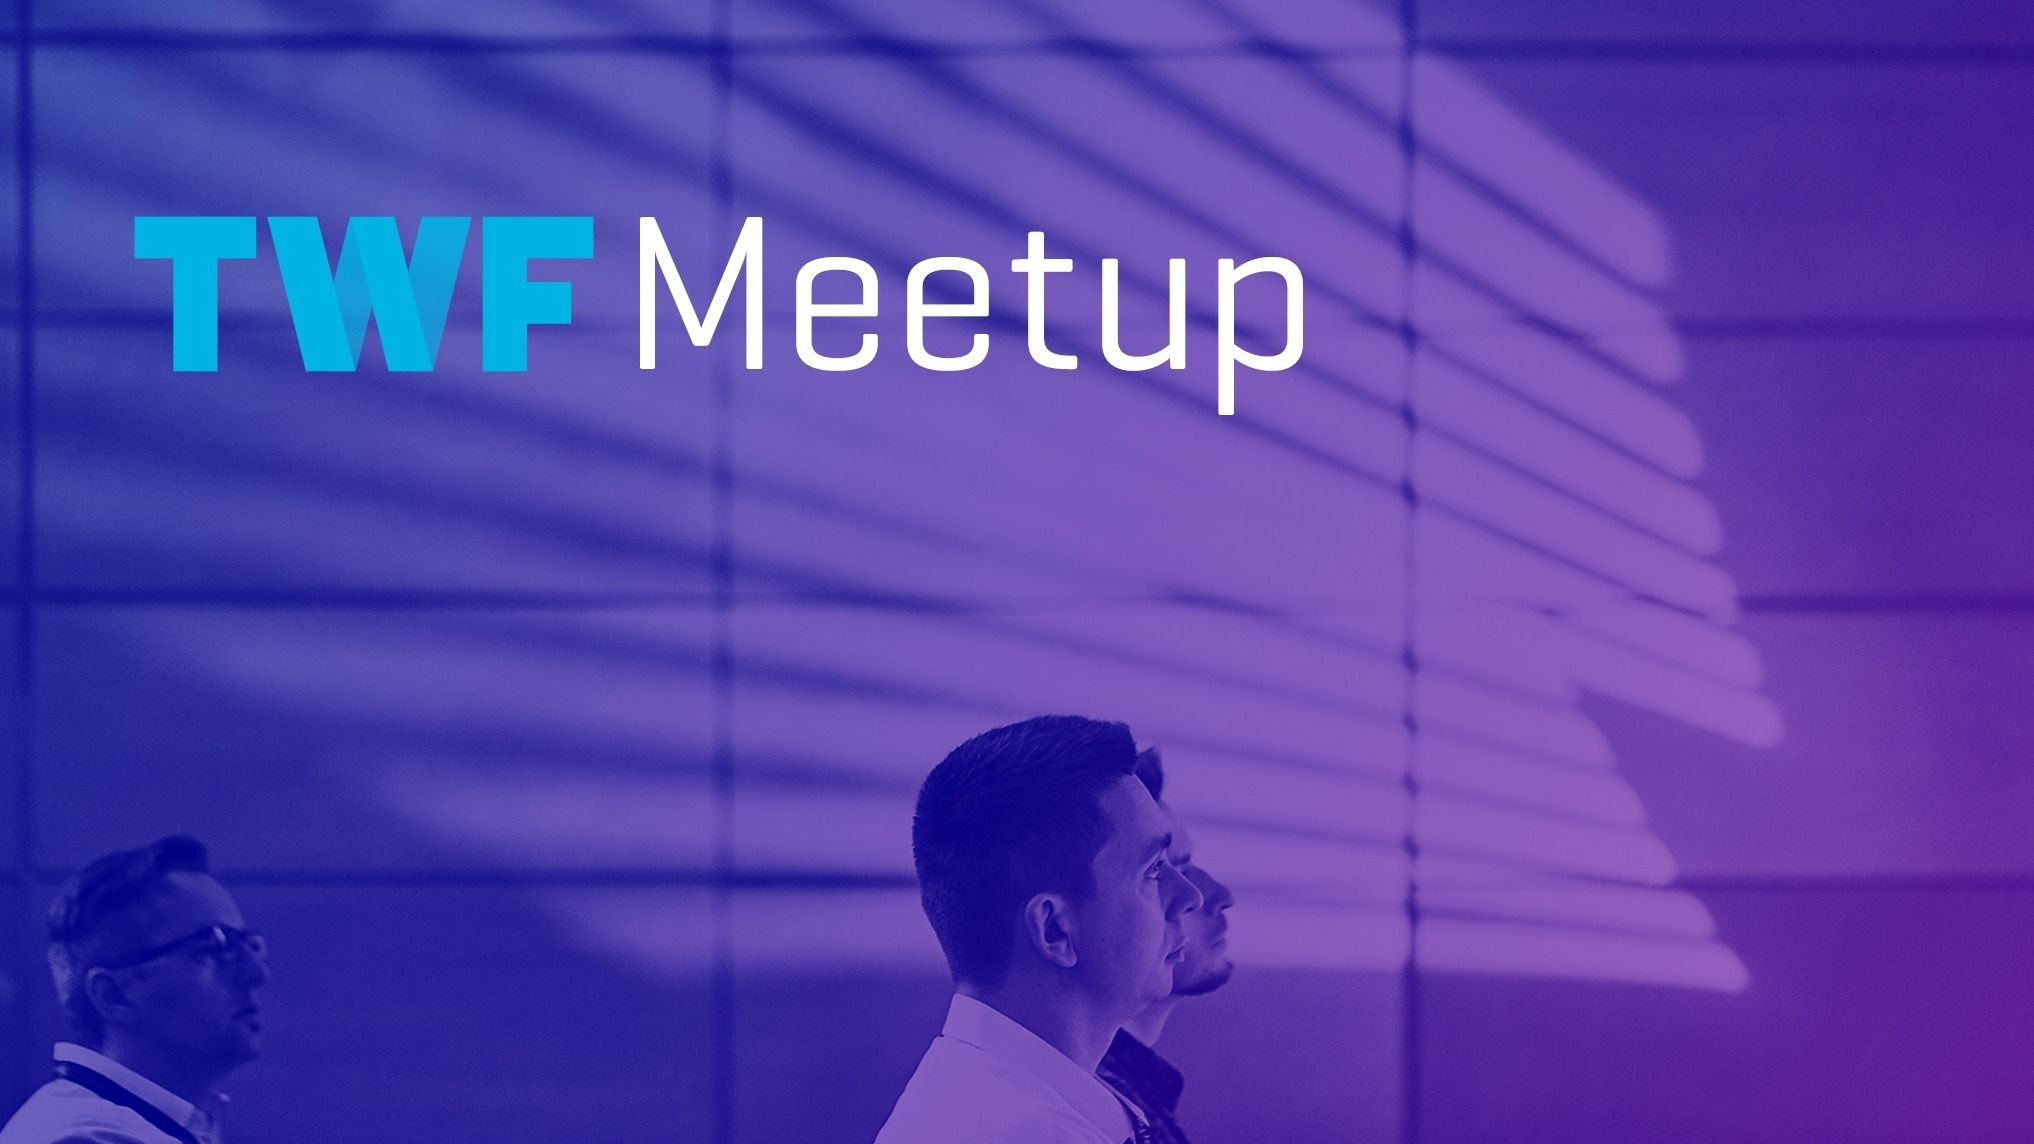 TWF Meetup